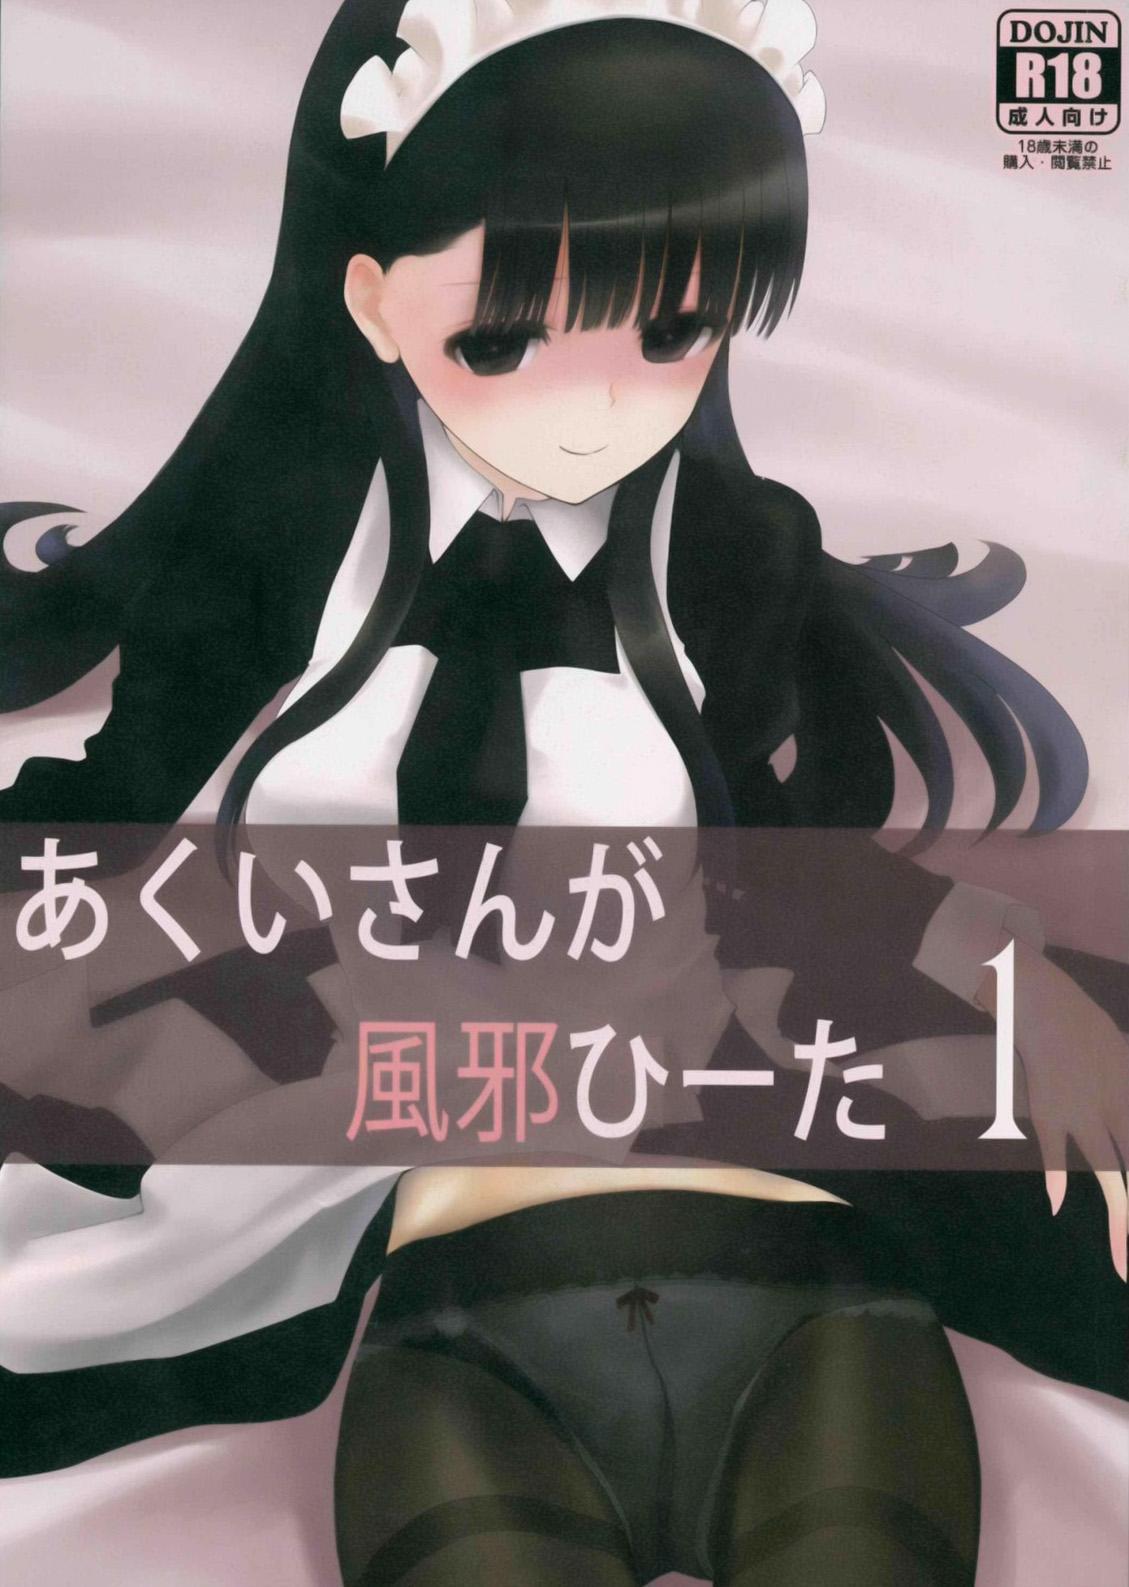 [Heikoushihenkei (Kawanakajima)] Akui-san ga Kaze hi-ta 1 [Chinese] [lolipoi汉化组] [2014-06-10] 1